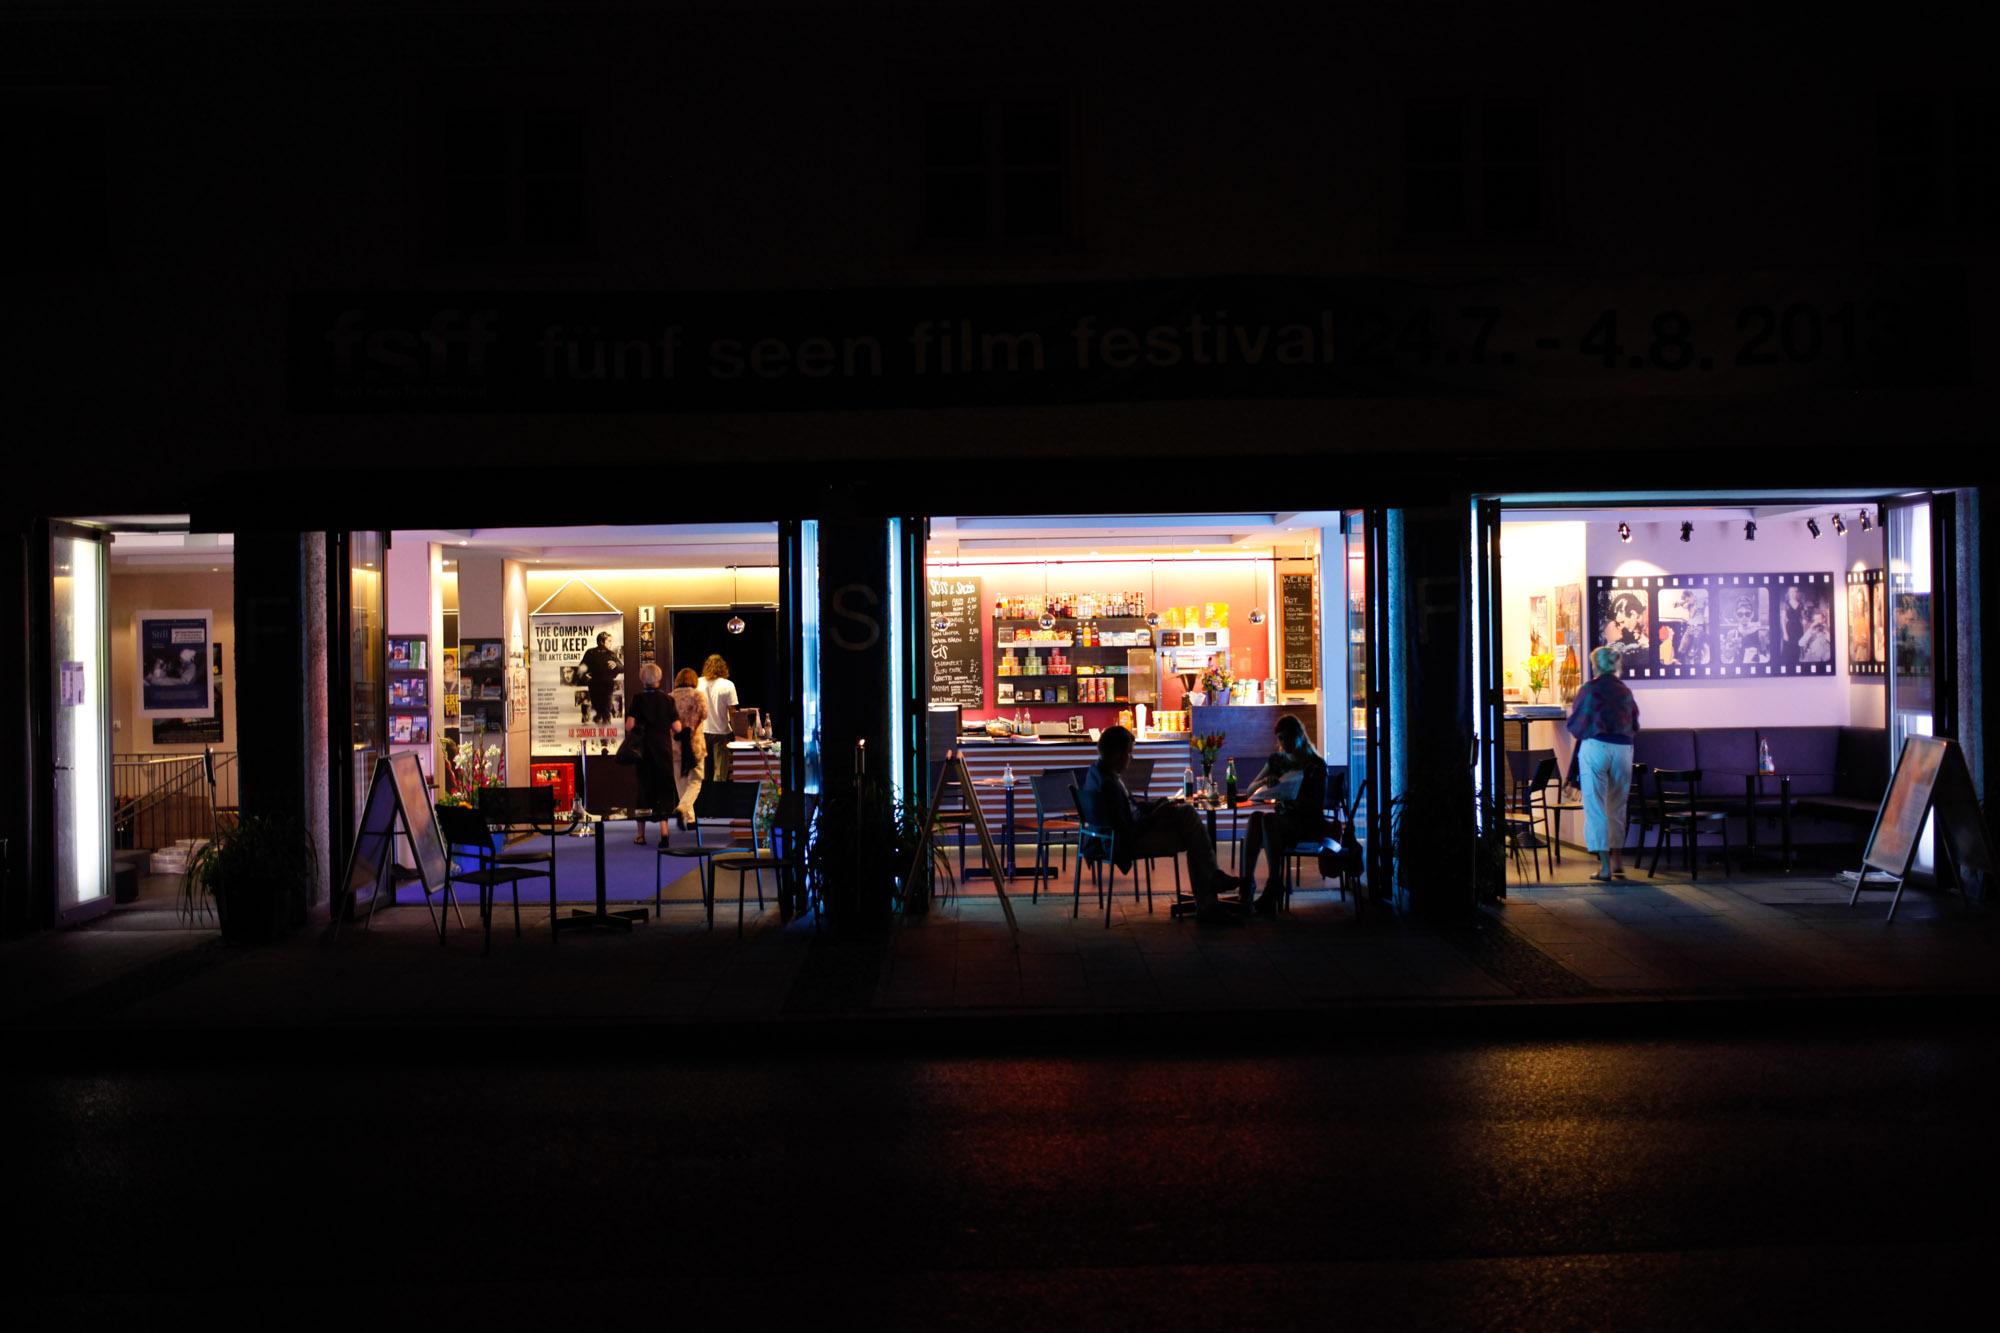 Breitwand Kino Starnberg Programm